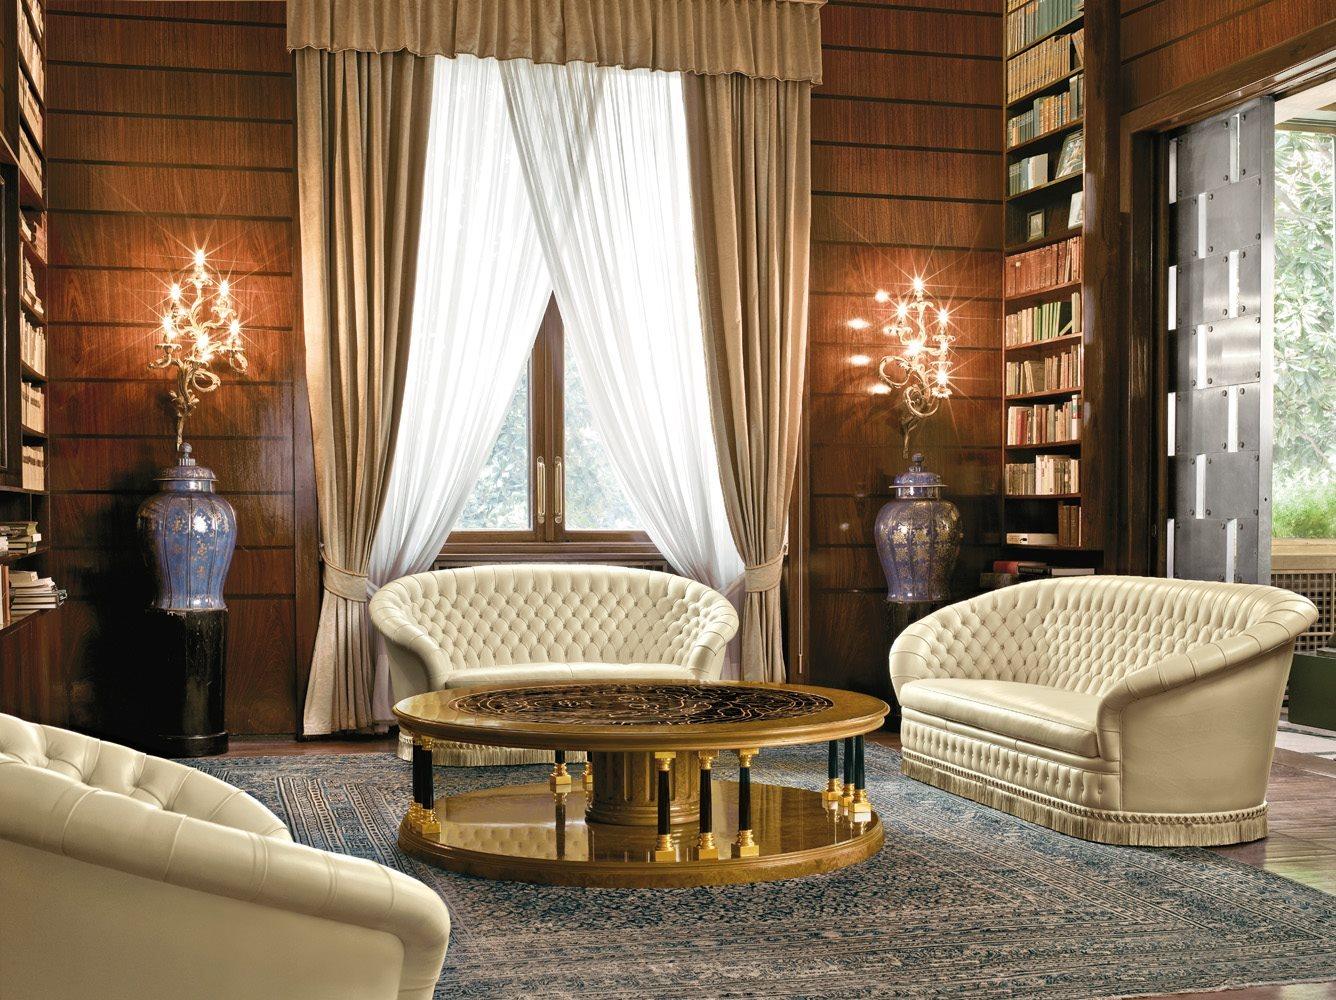 Tavolo dorotheum round table mascheroni - Tavoli e tavolini ...